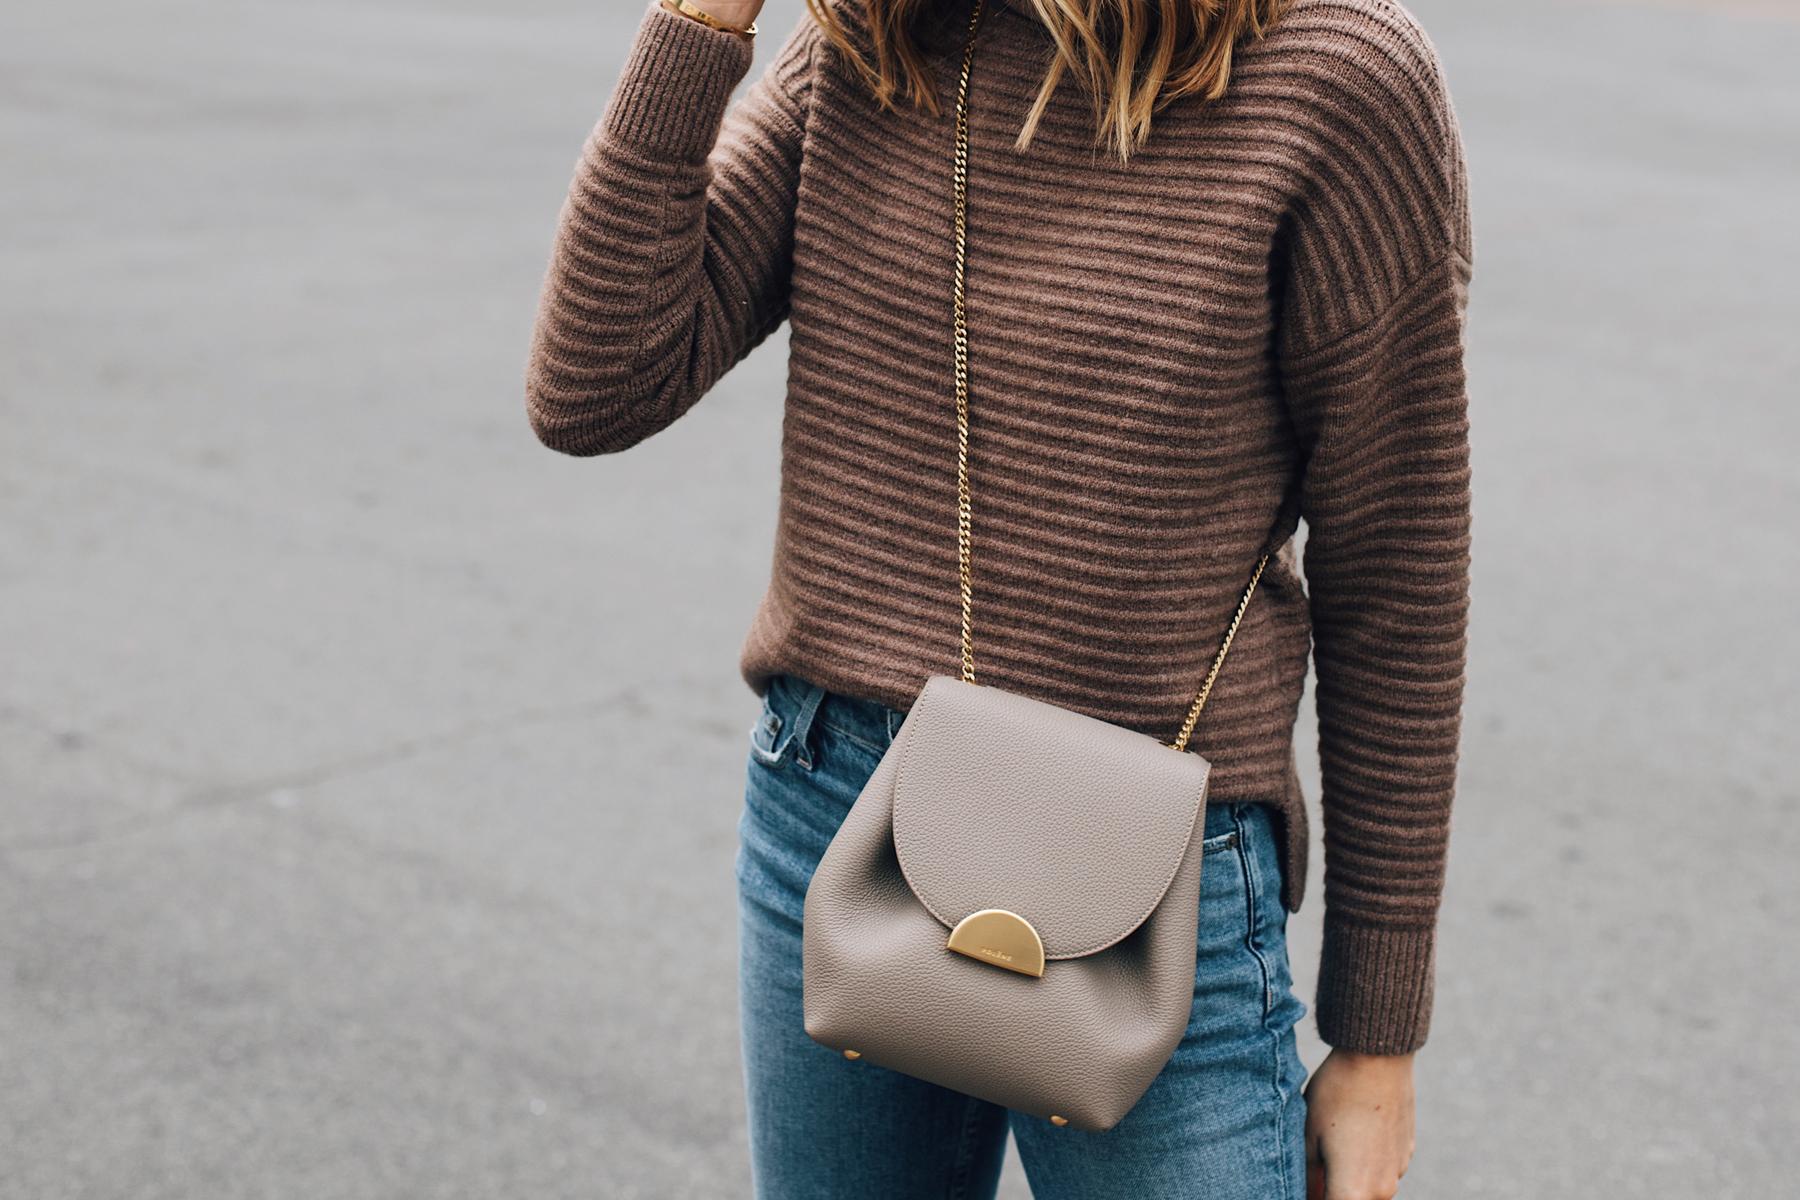 Woman Wearing Madewell Brown Sweater Polene Grey Handbag Fashion Jackson San Diego Fashion Blogger Street Style